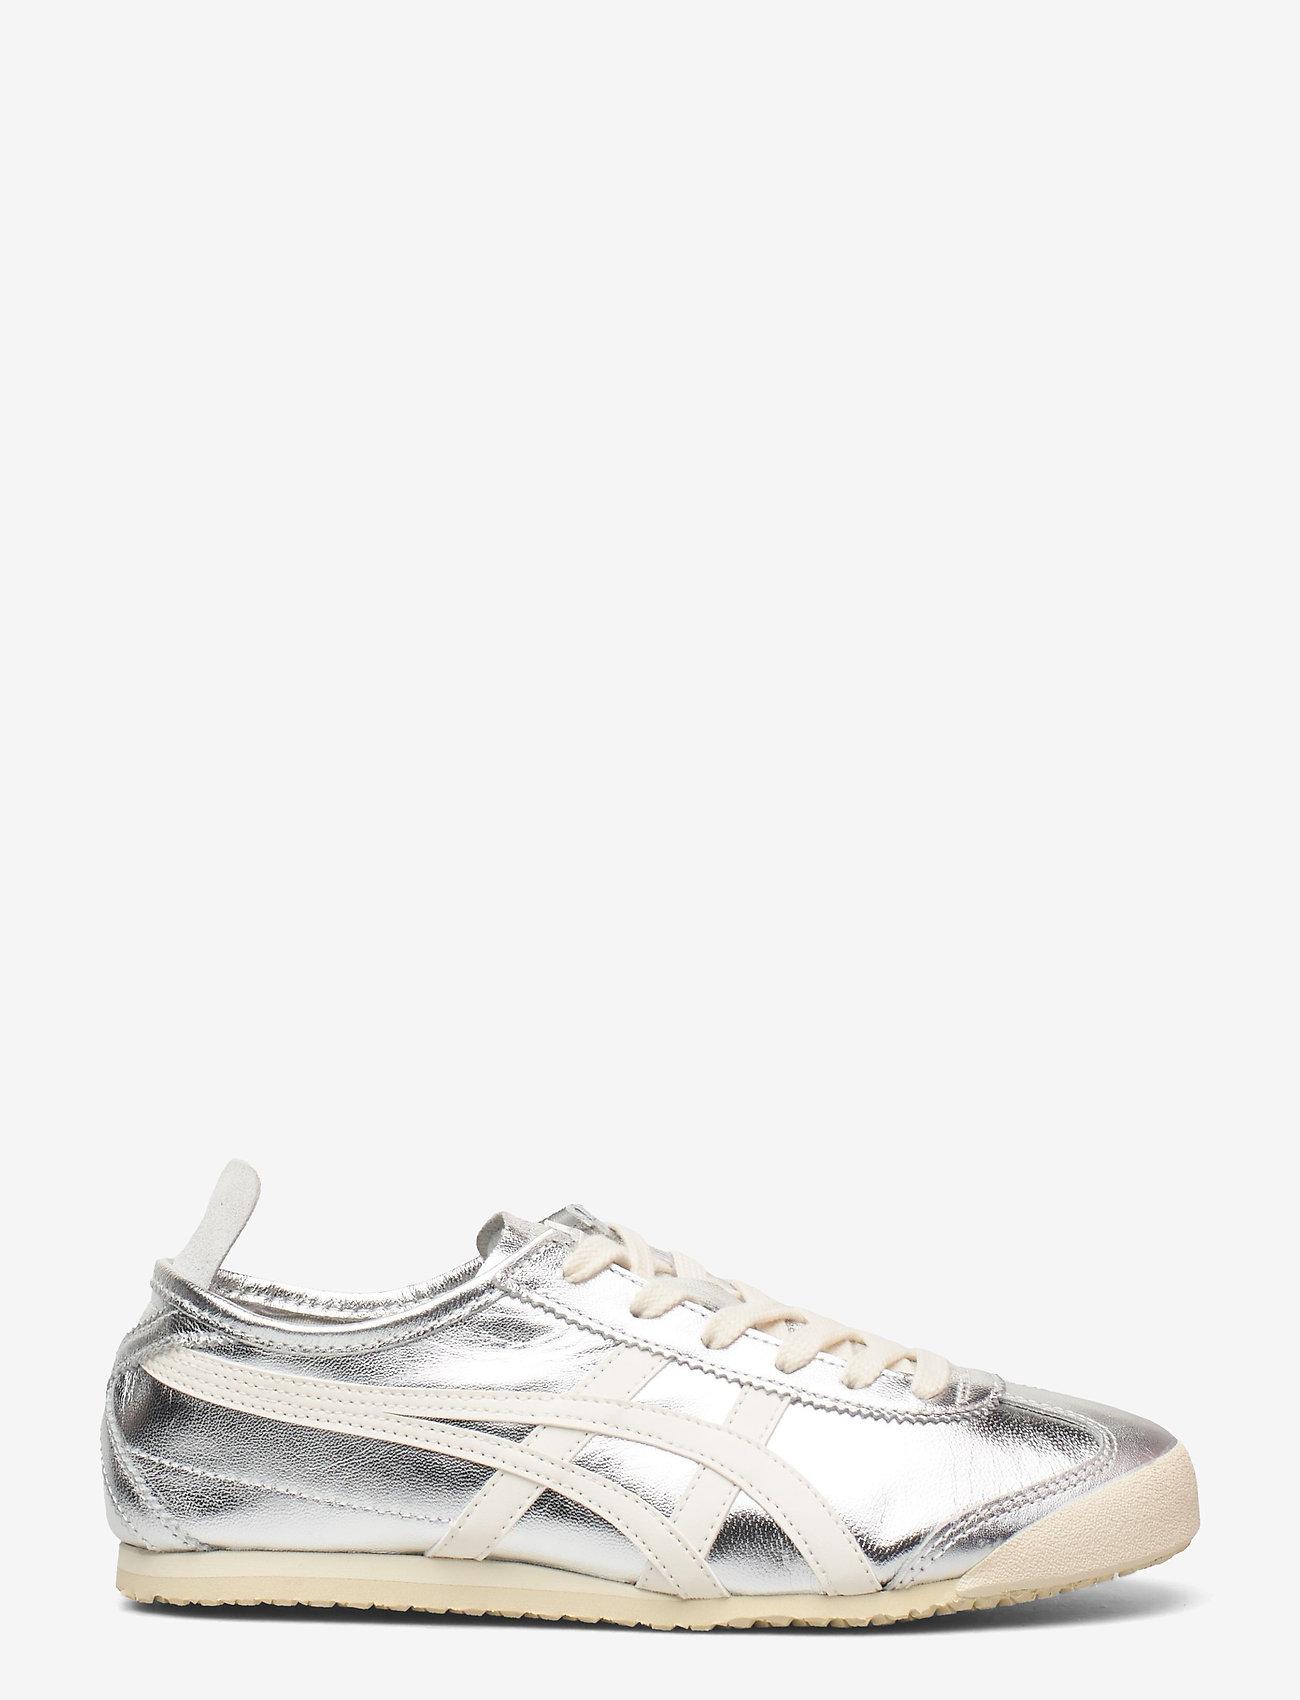 Onitsuka Tiger - MEXICO 66 - sneakers - silver/white - 1